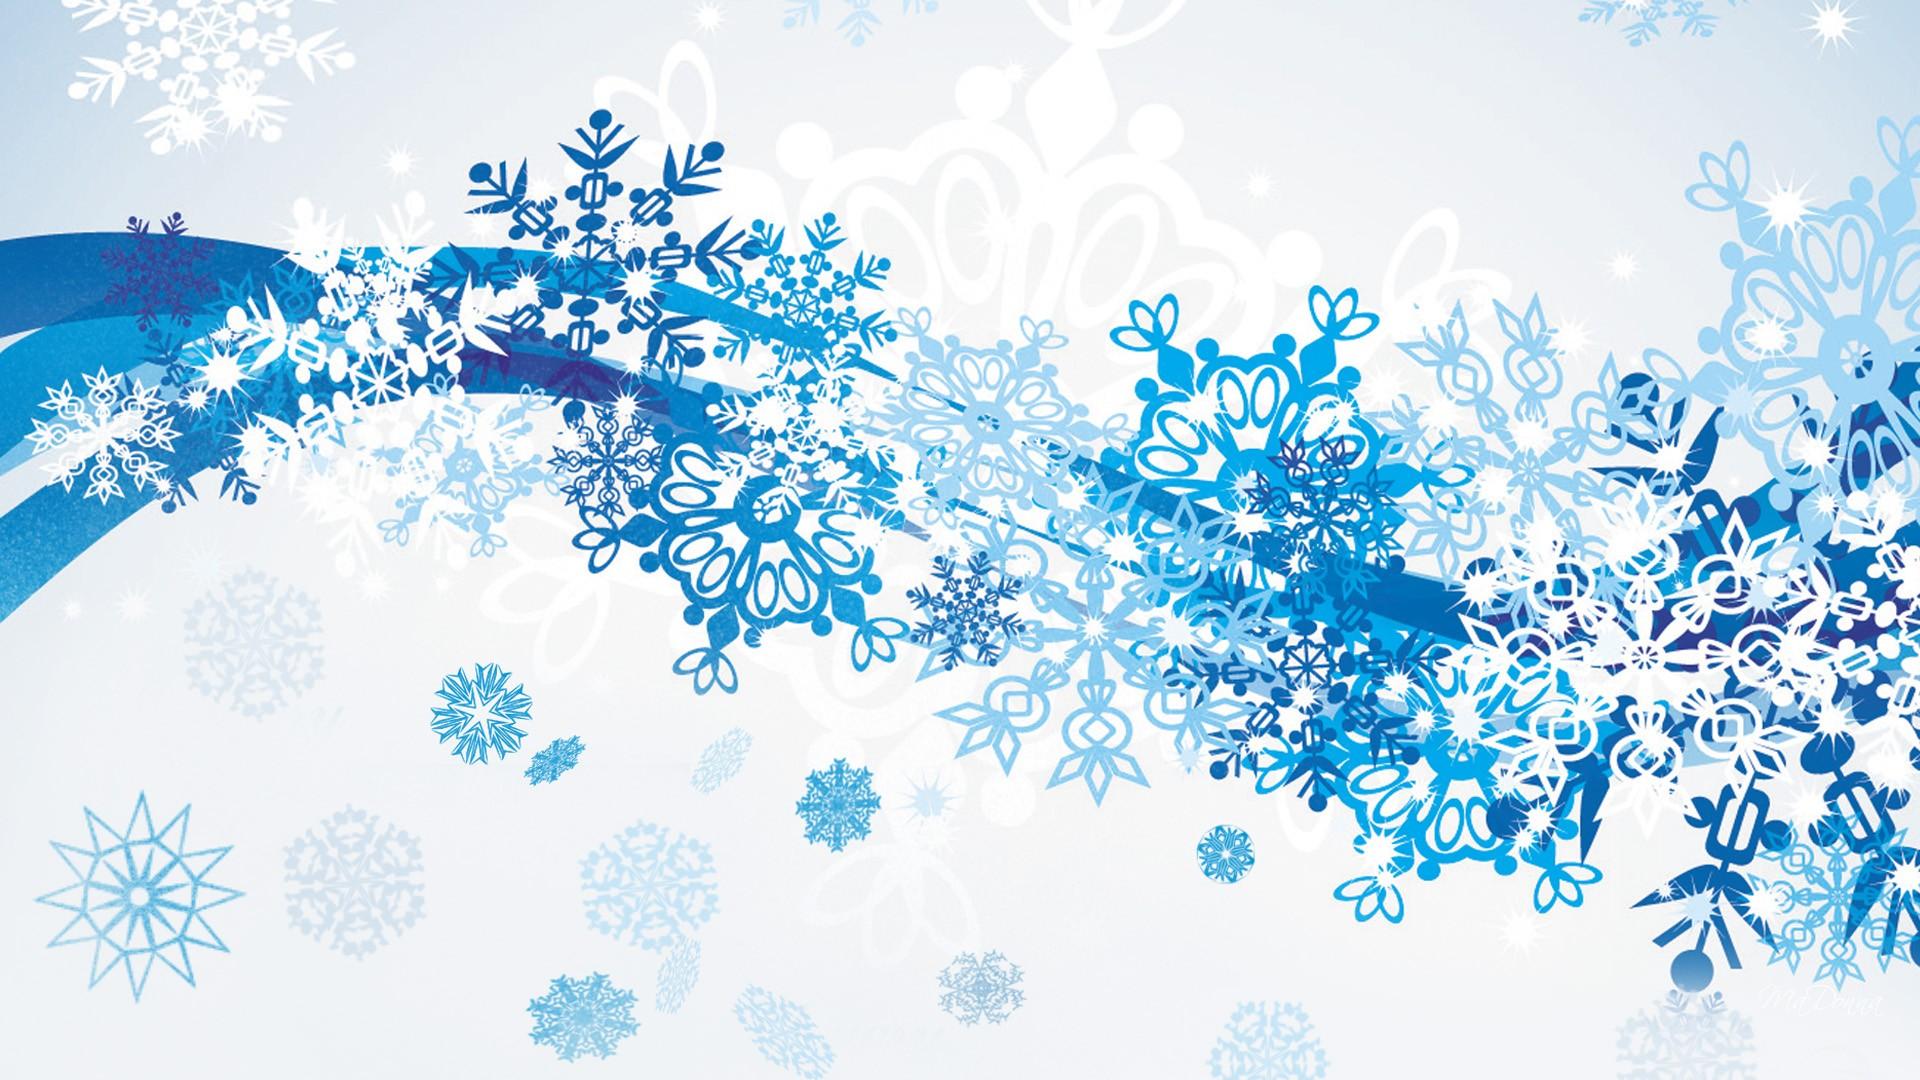 Snow Desktop Wallpapers   Wallpaper High Definition High Quality 1920x1080